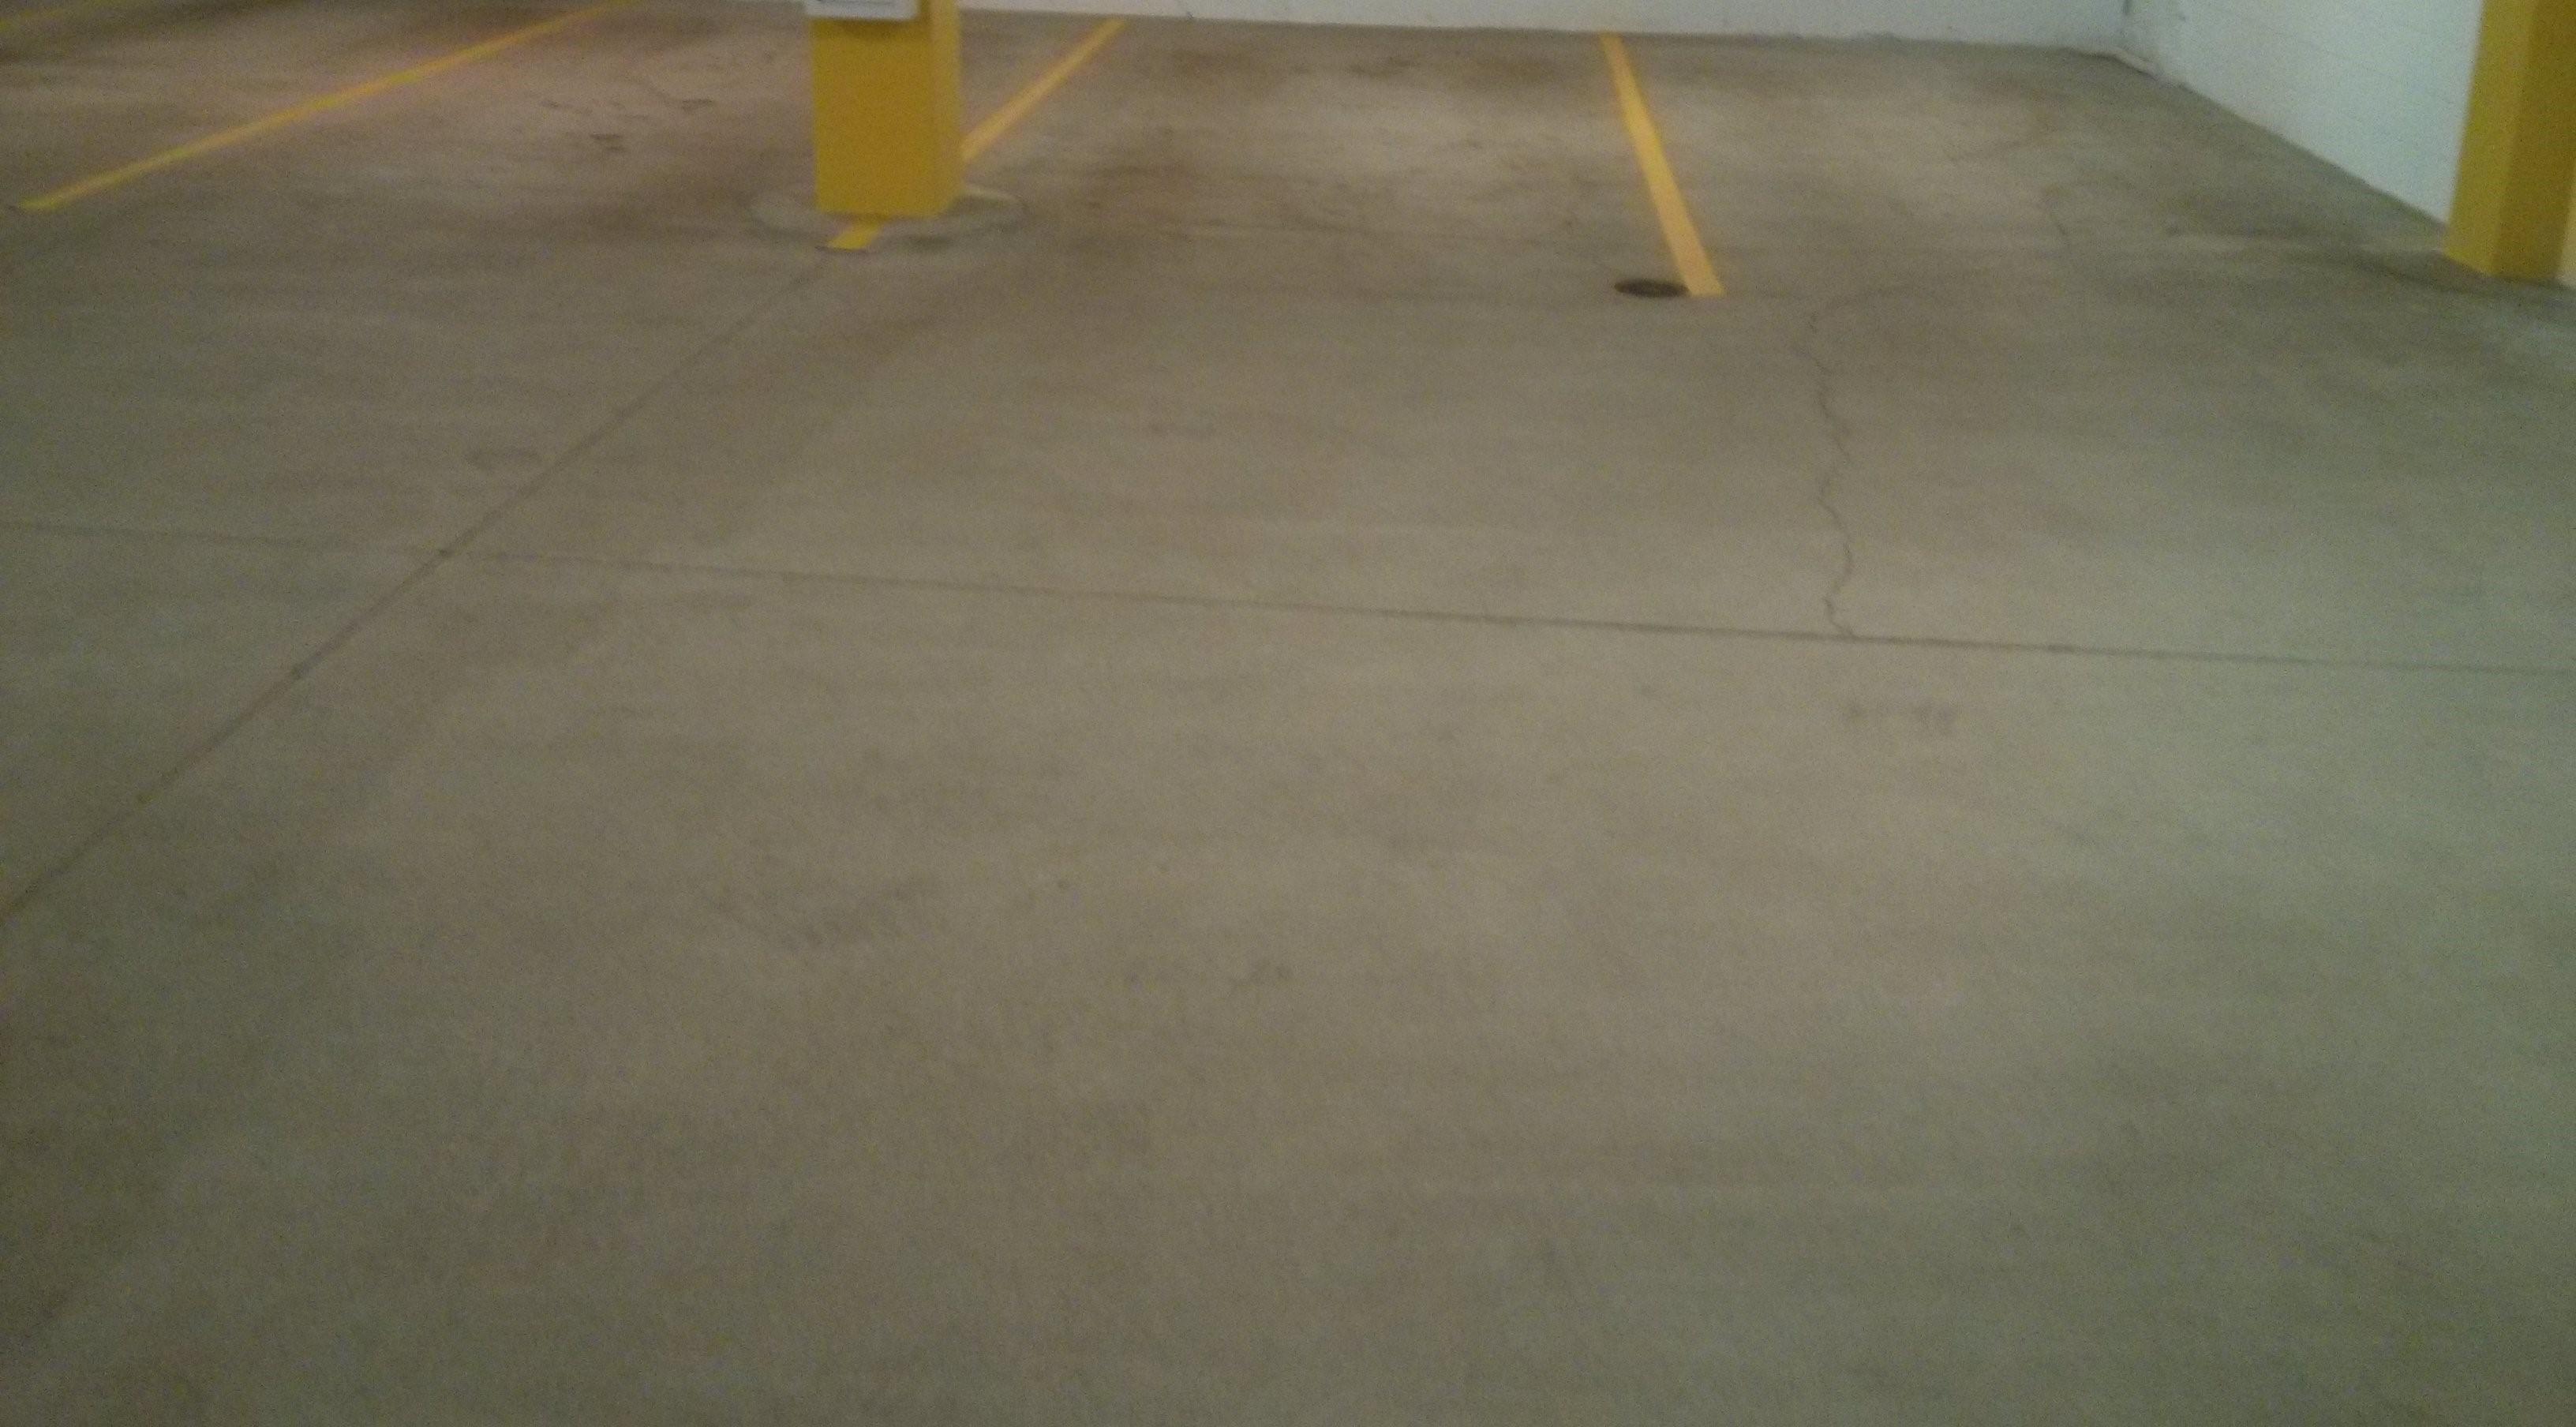 Parking garage re striping services in wayzata mn for Garage floor cleaning service